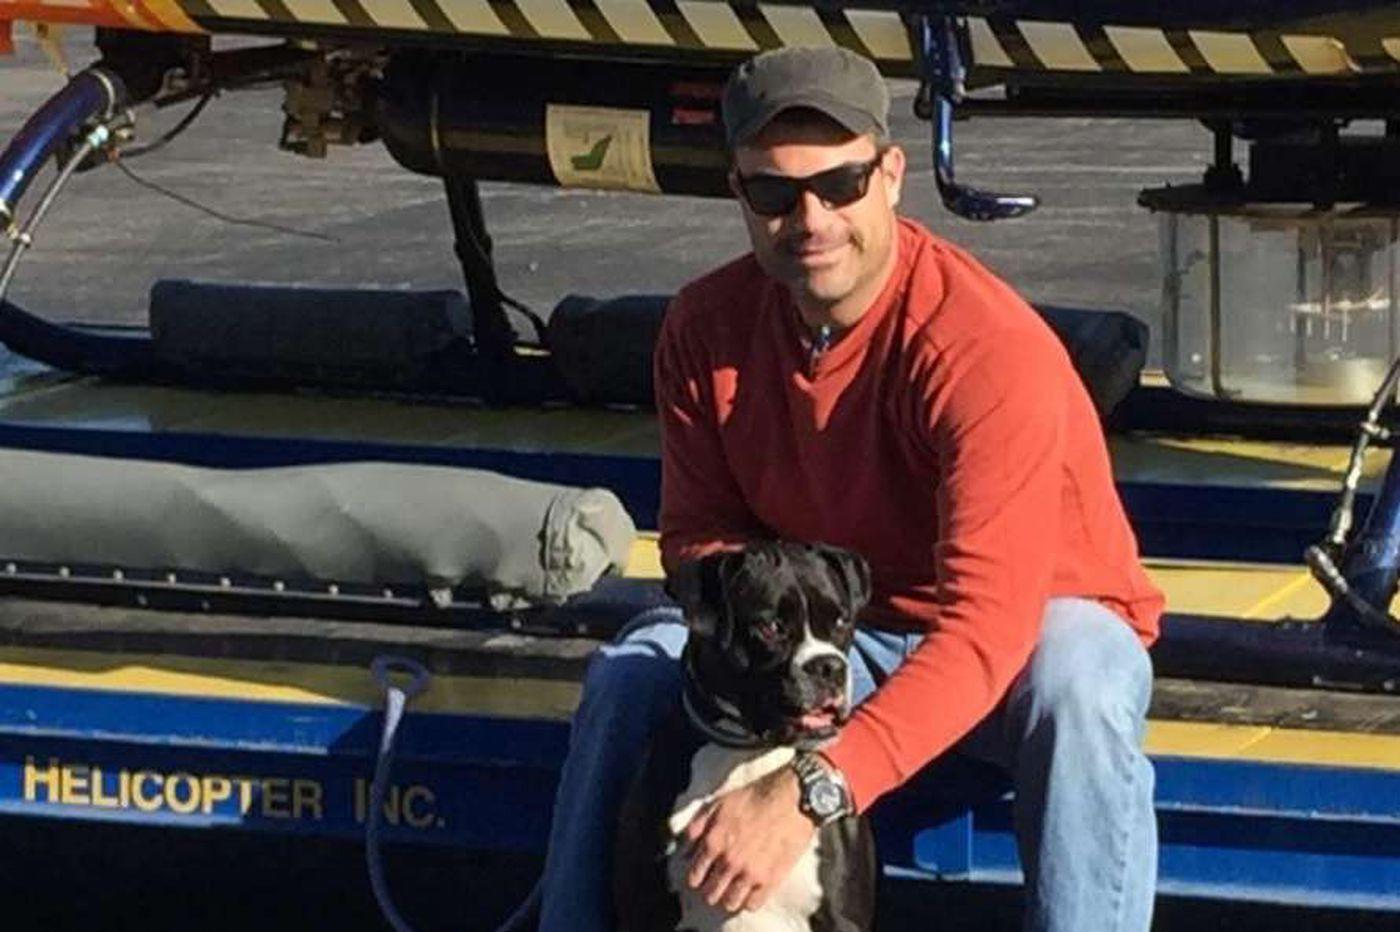 Michael R. Murphy, 37, Penn Health helicopter pilot